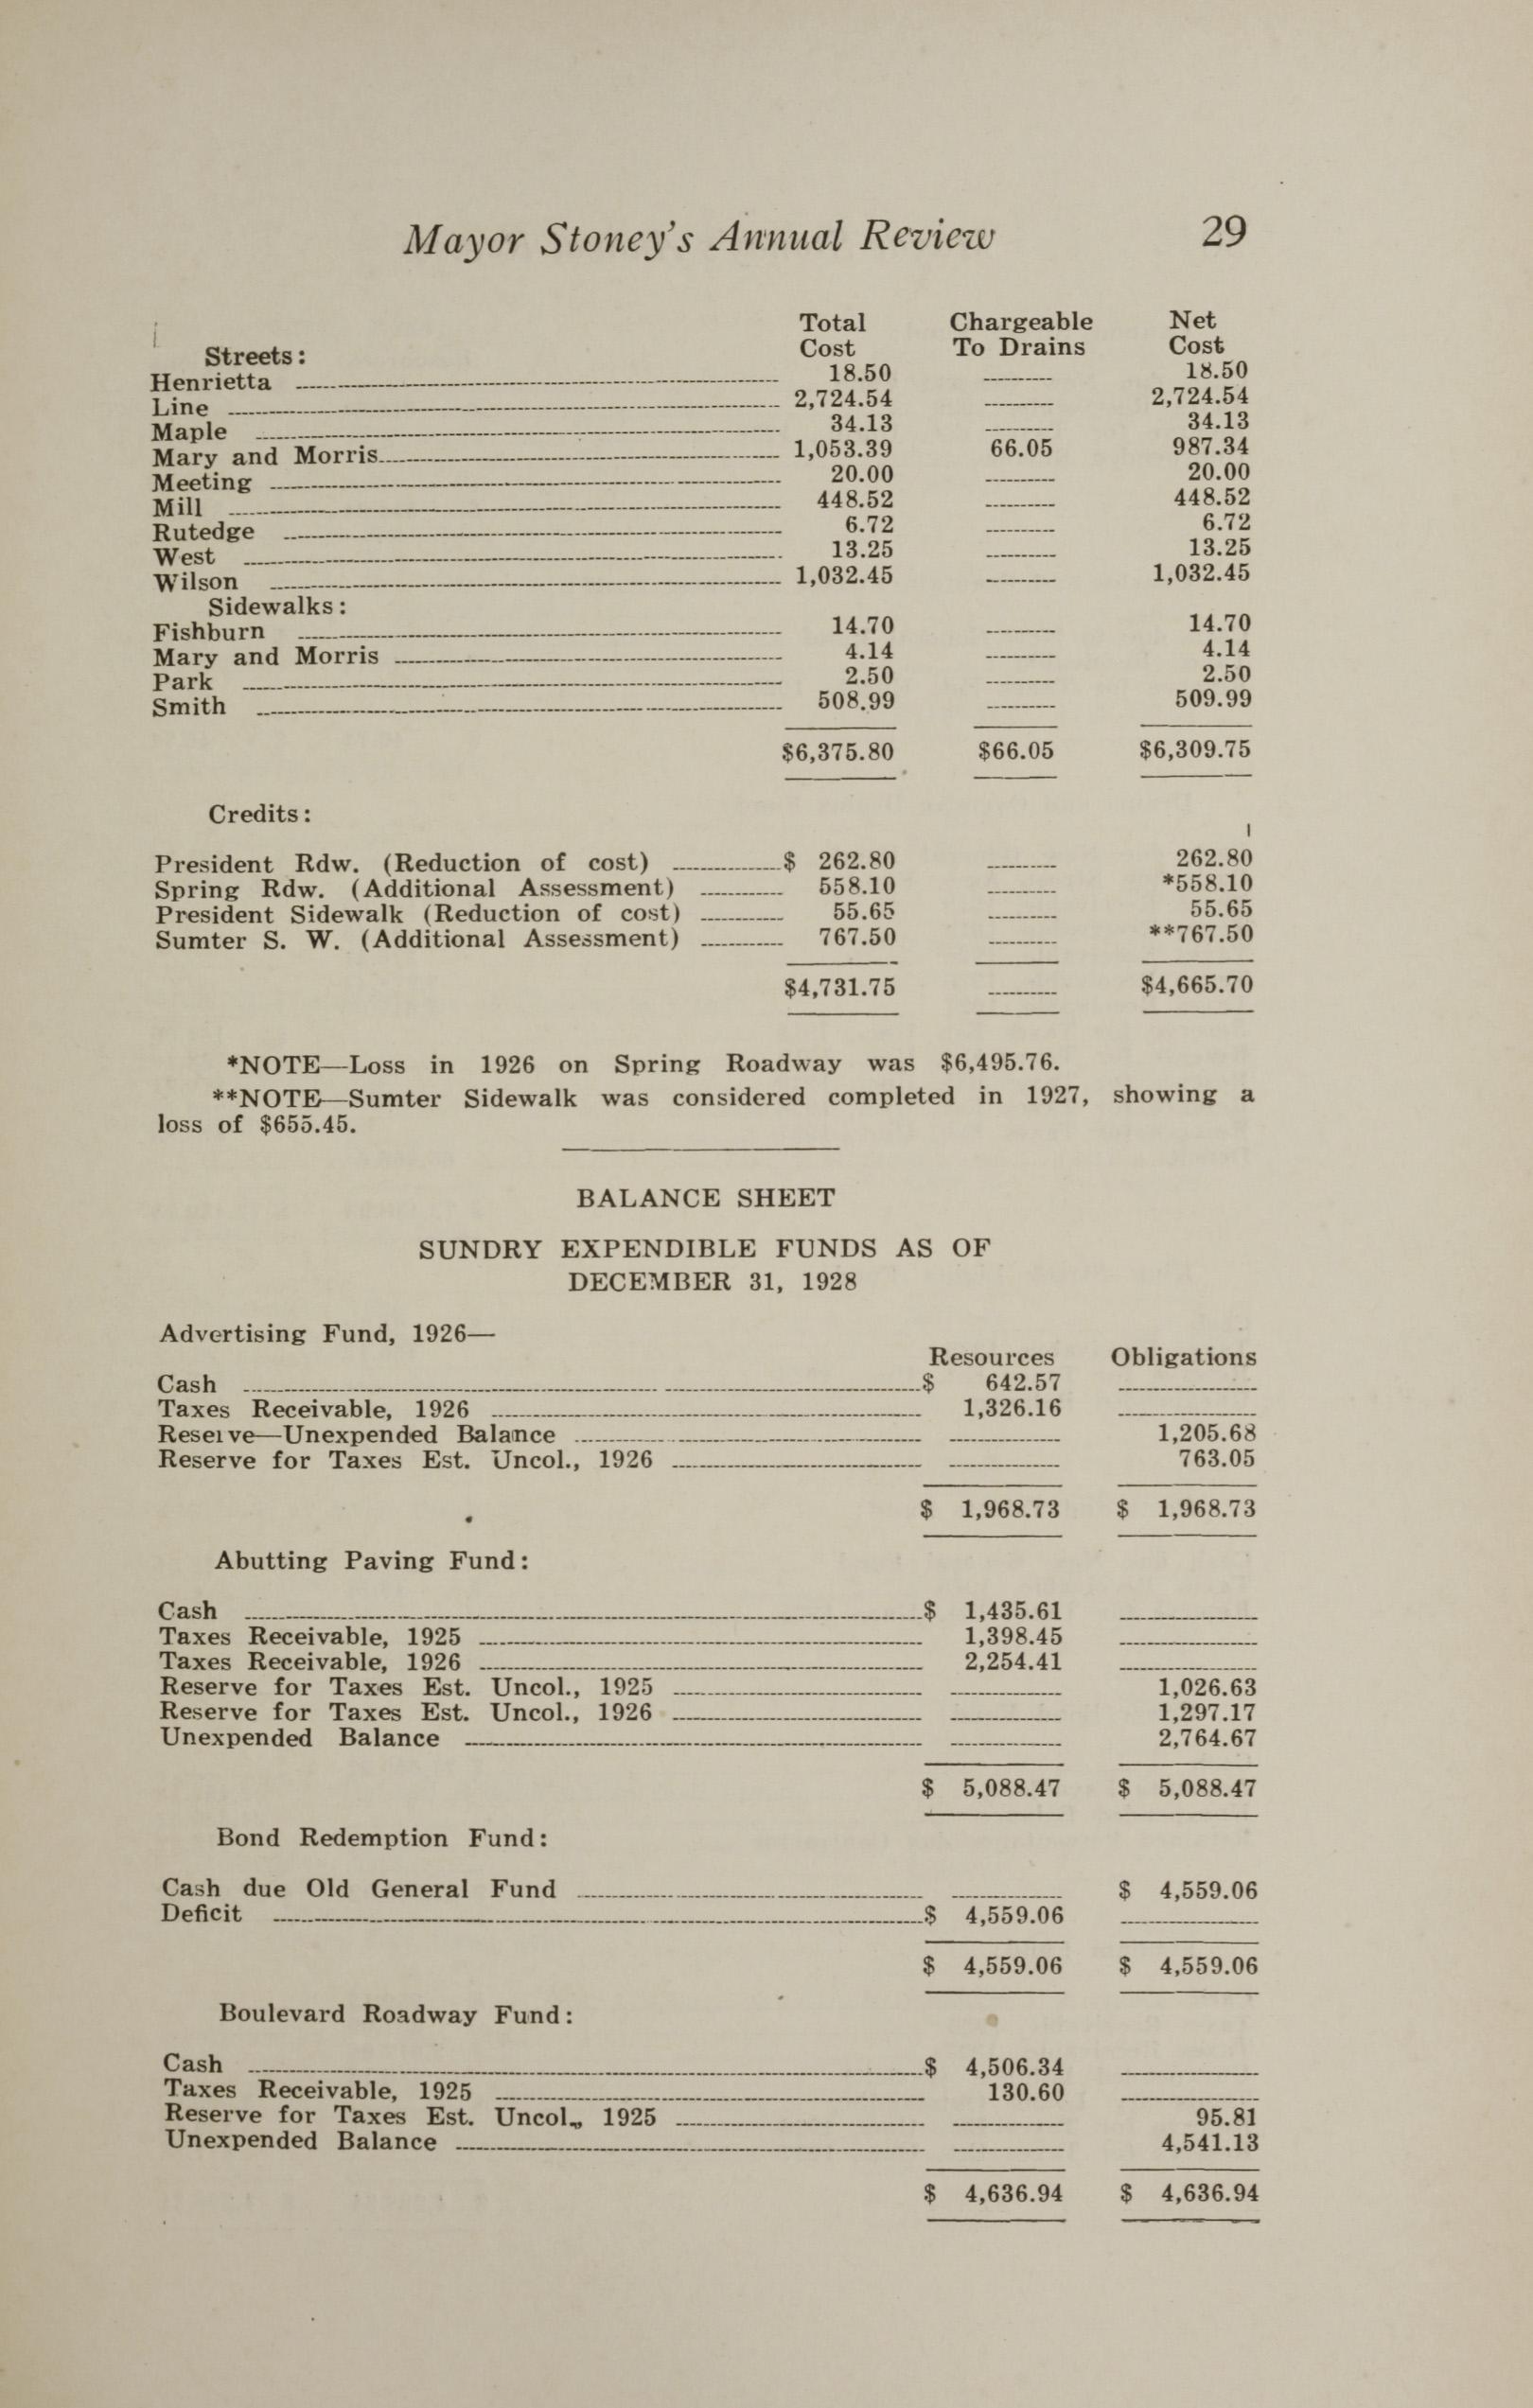 Charleston Yearbook, 1928, page 29